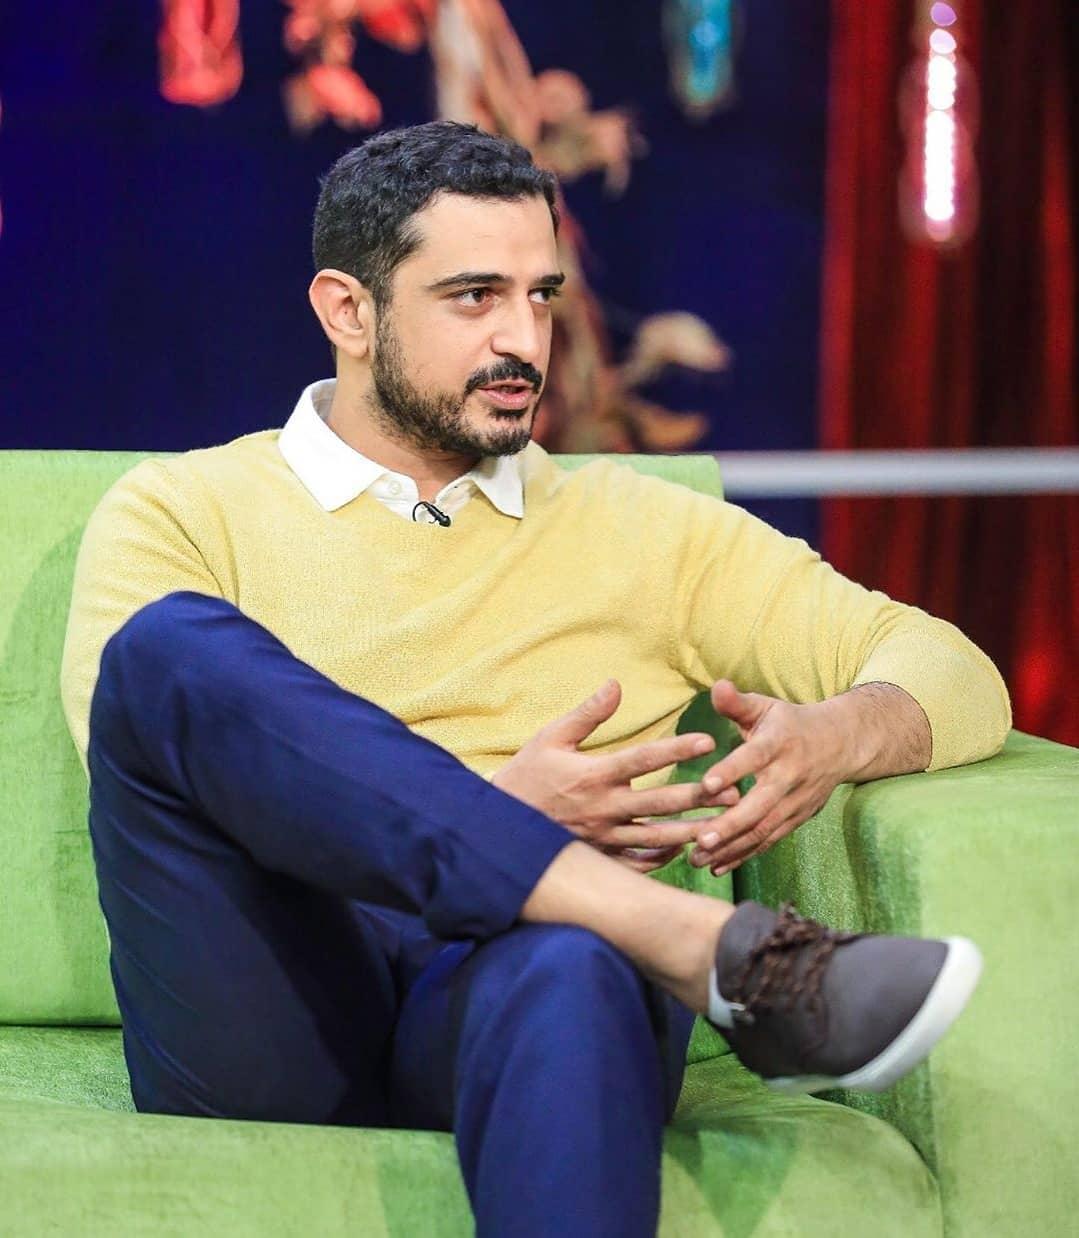 Newly Wed Actor Couple Faryal Mehmood and Daniyal Raheal on Bol Nights